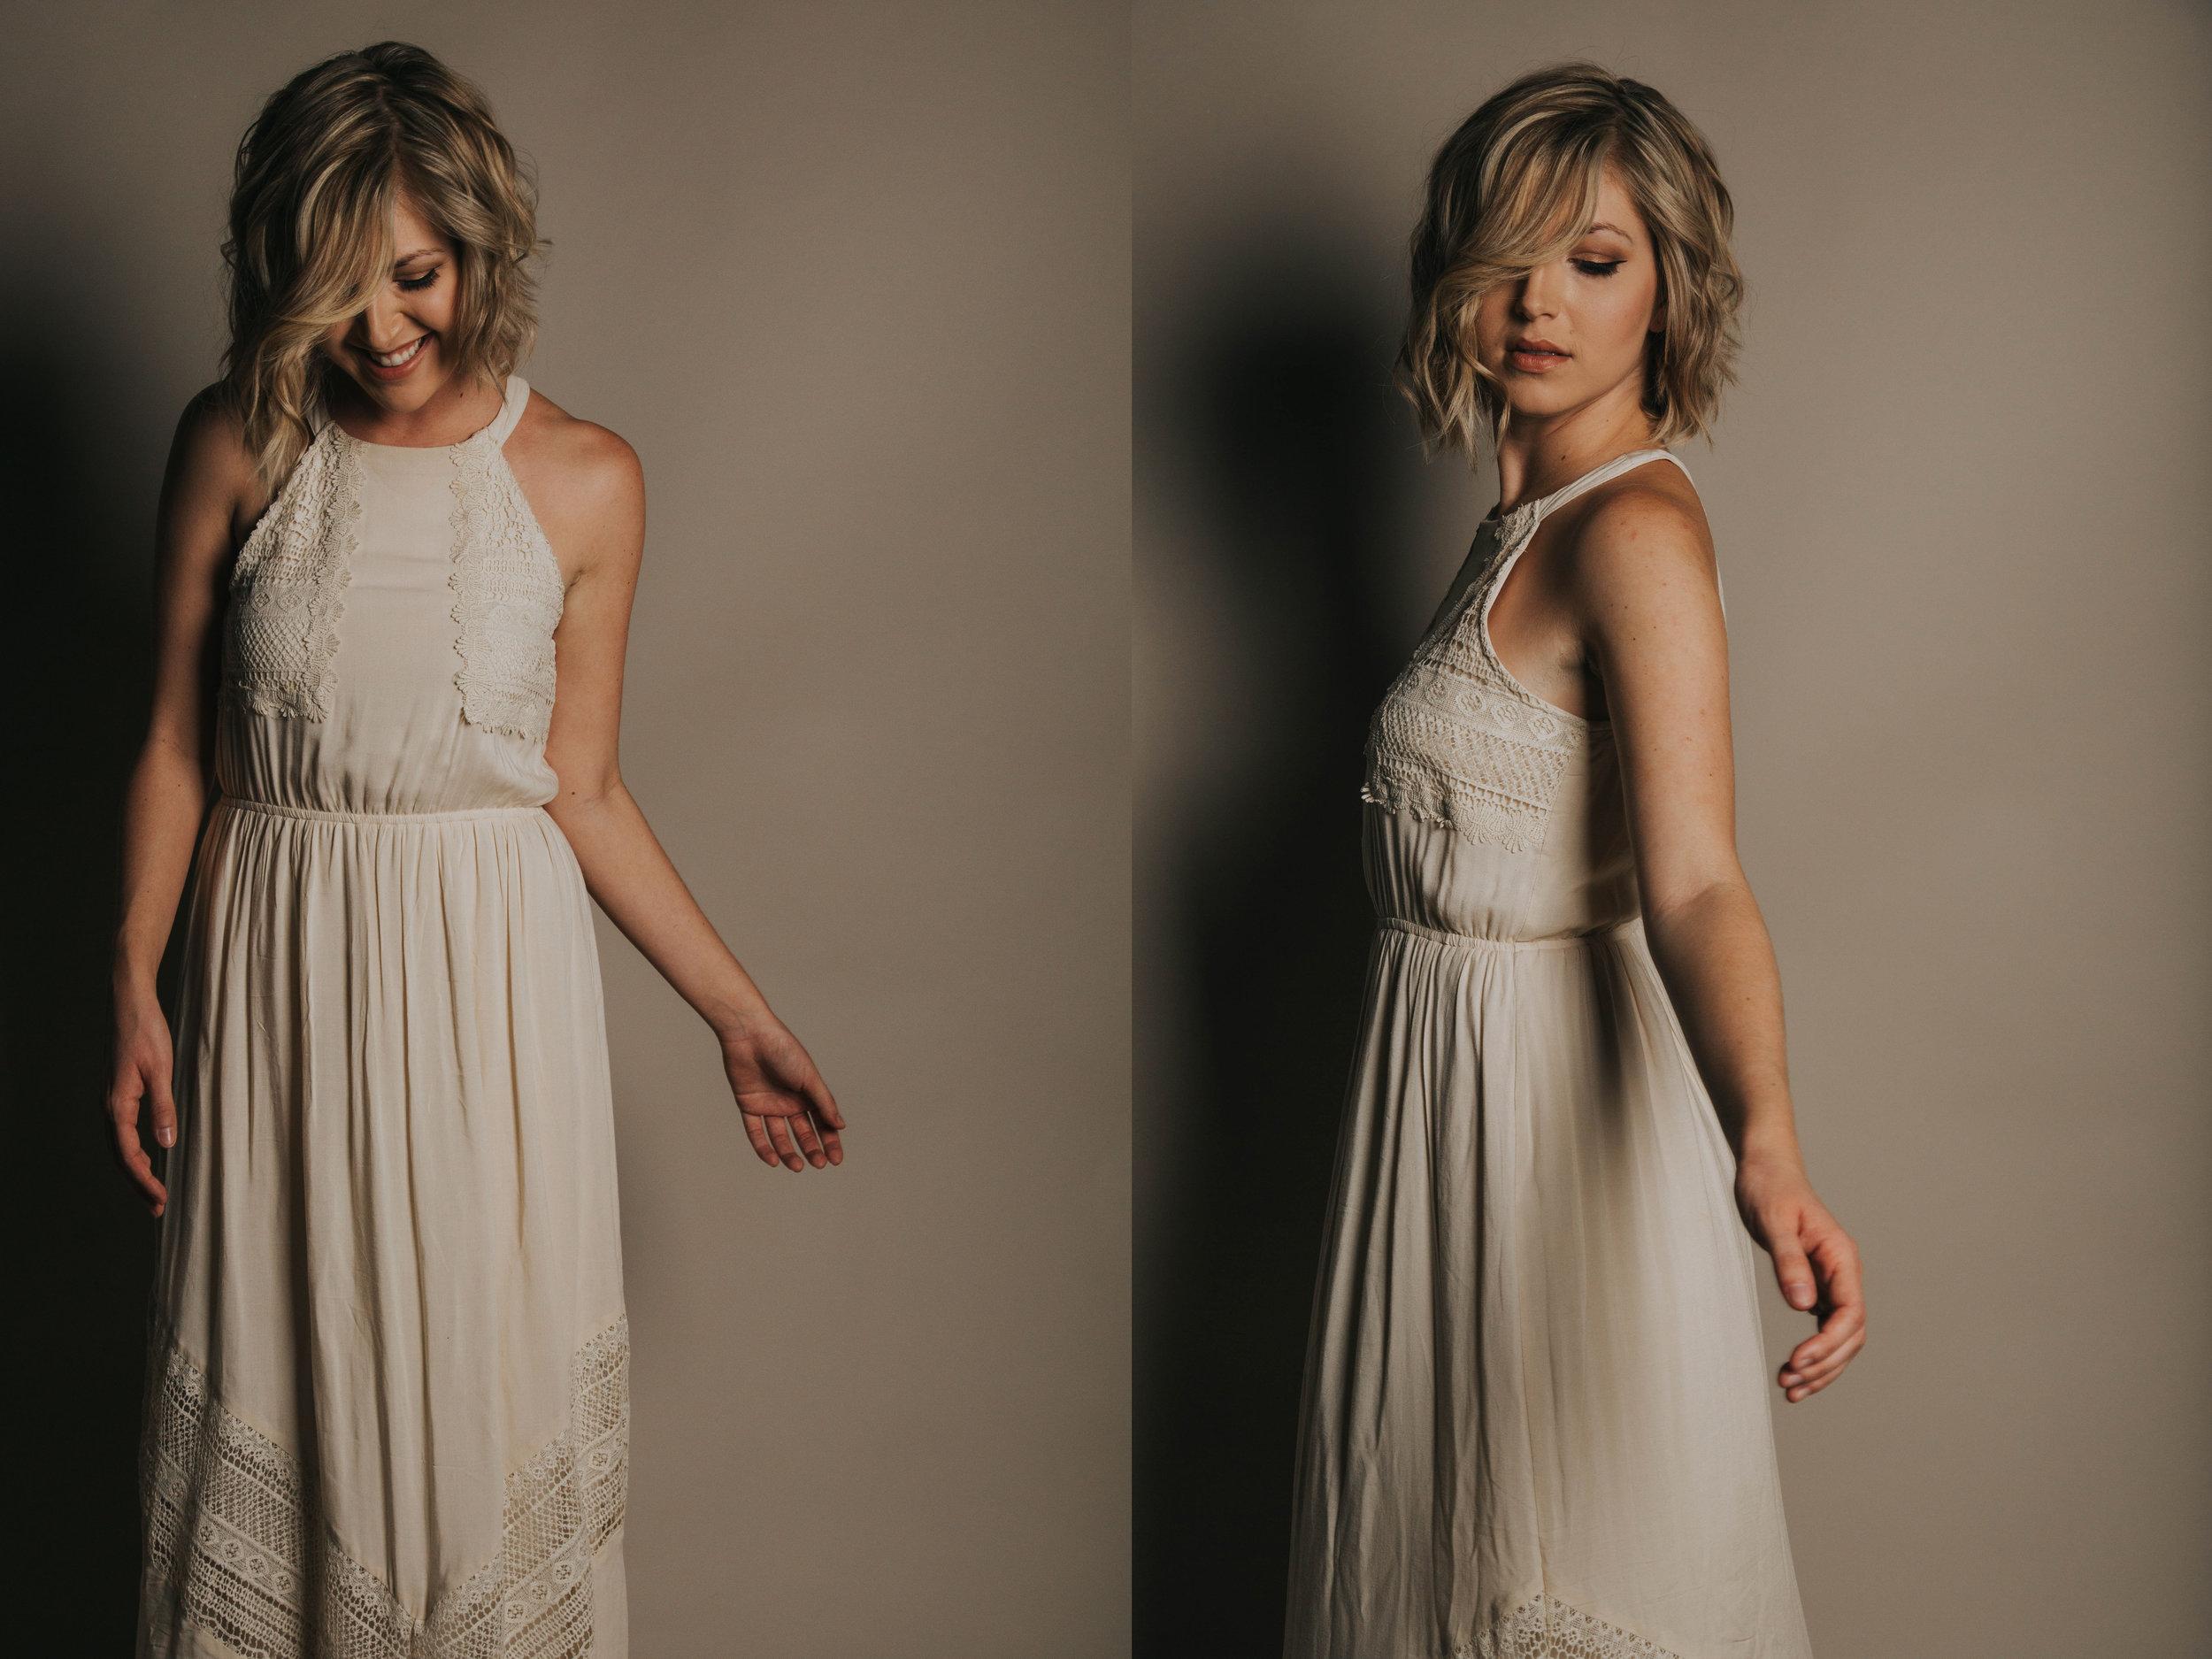 Julie Thurman - Blog - Portraits - 02.jpg